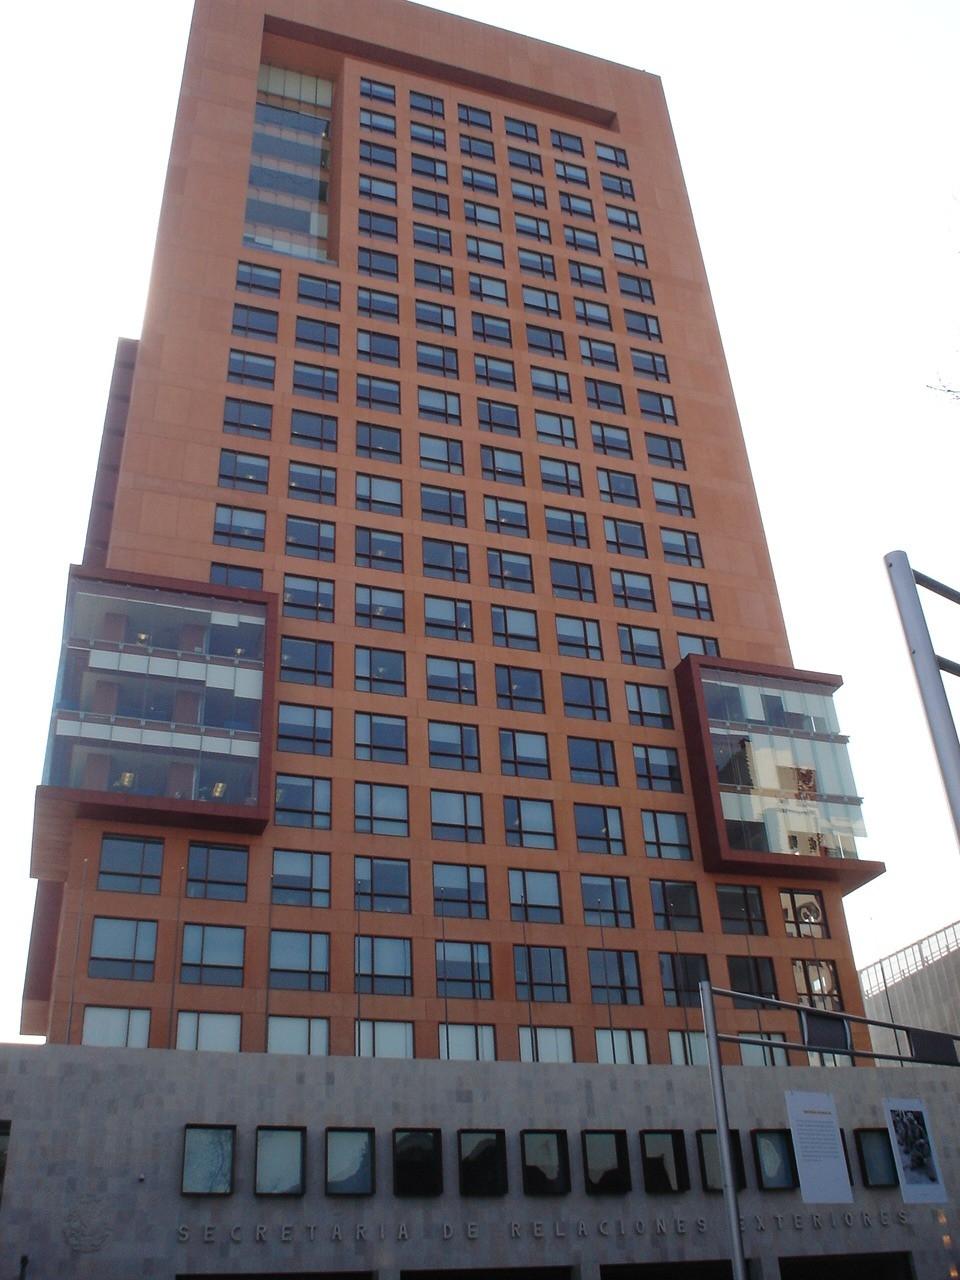 Arquitecto del mes claudiacarolina260190 for Blau hotels oficinas centrales